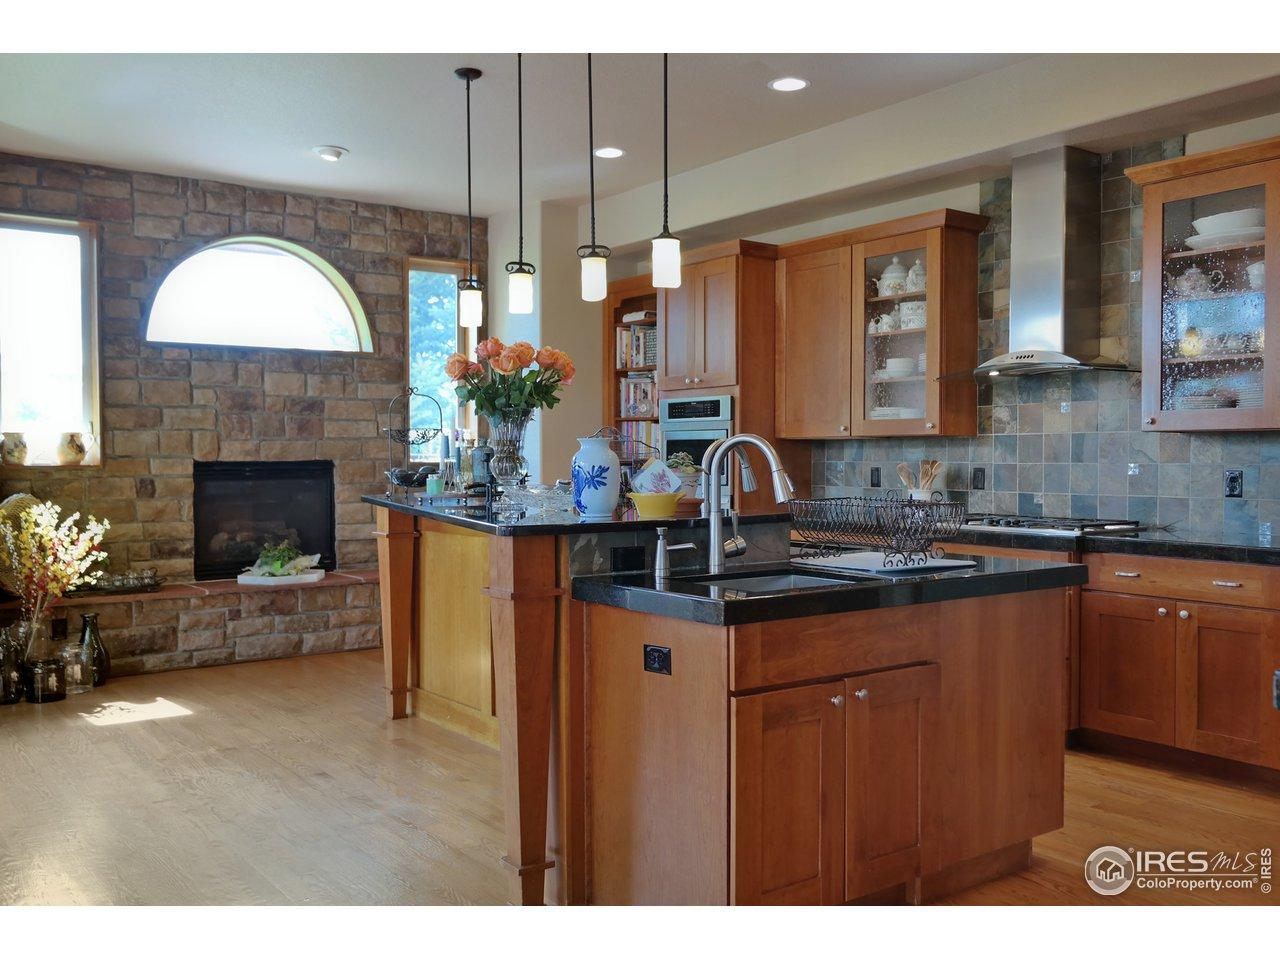 Stylish Gas Fireplace in Kitchen